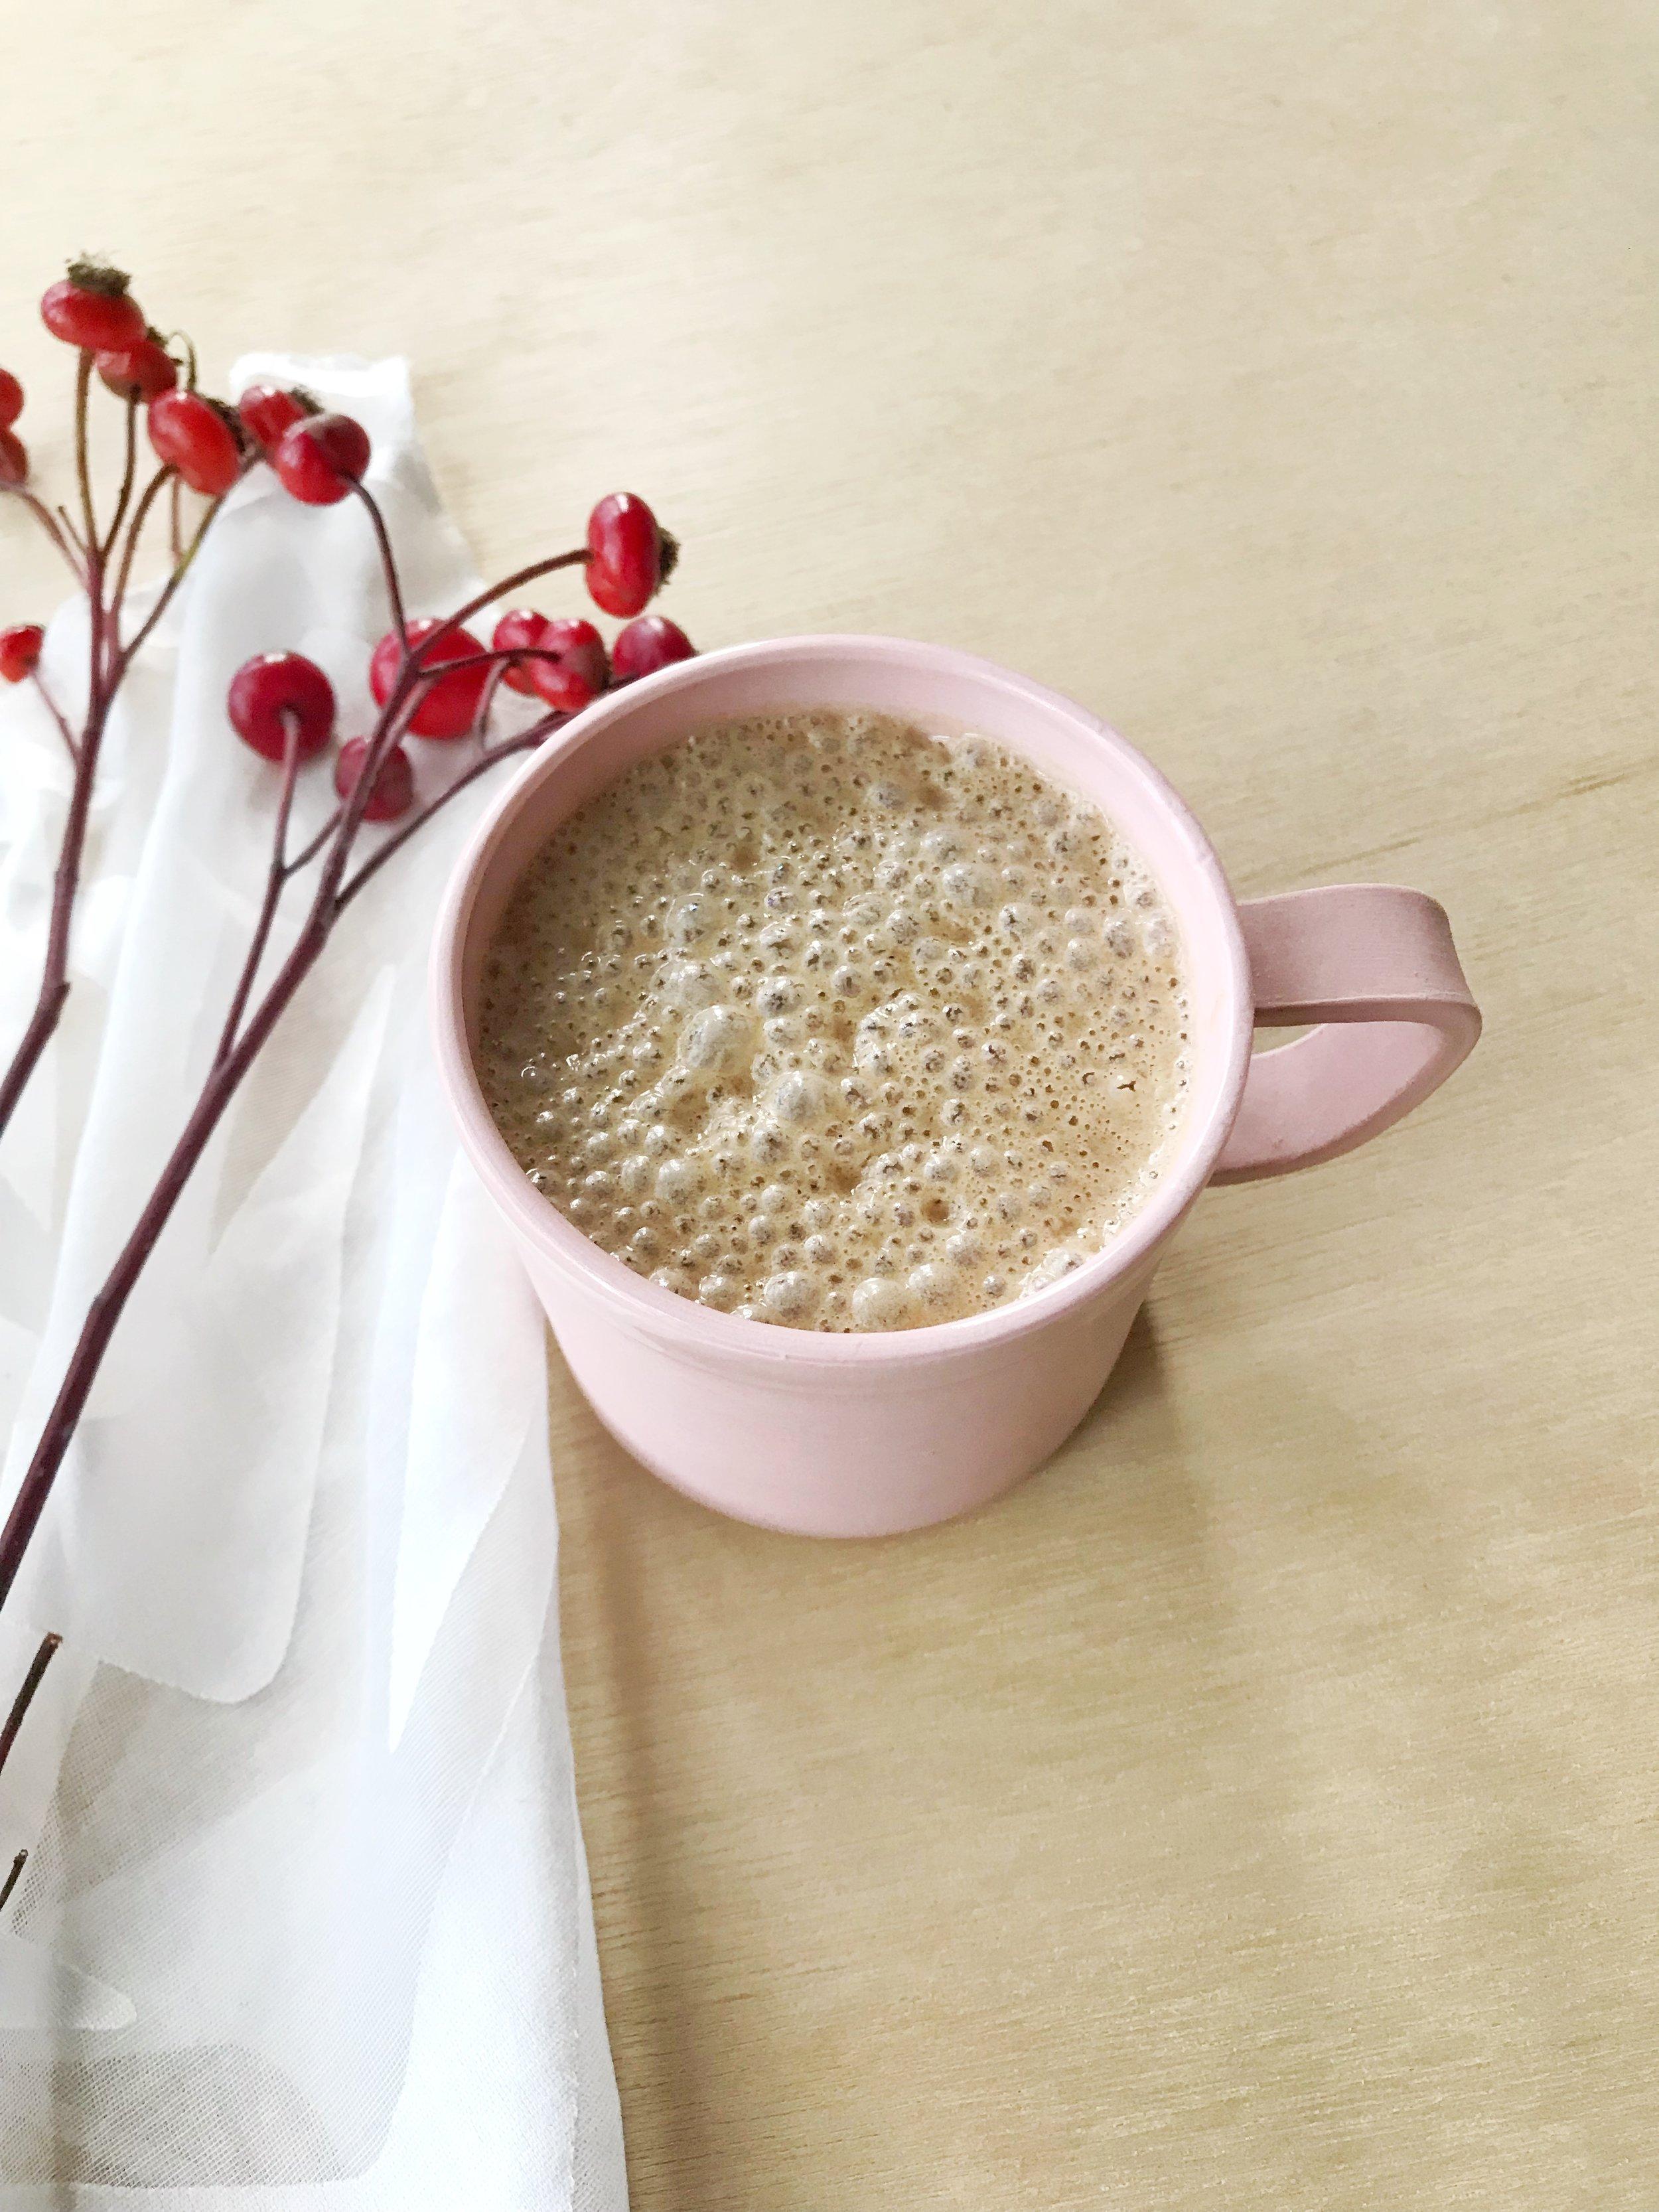 Holistic Heels Creamy Collagen Chai Tea Latte2.jpg